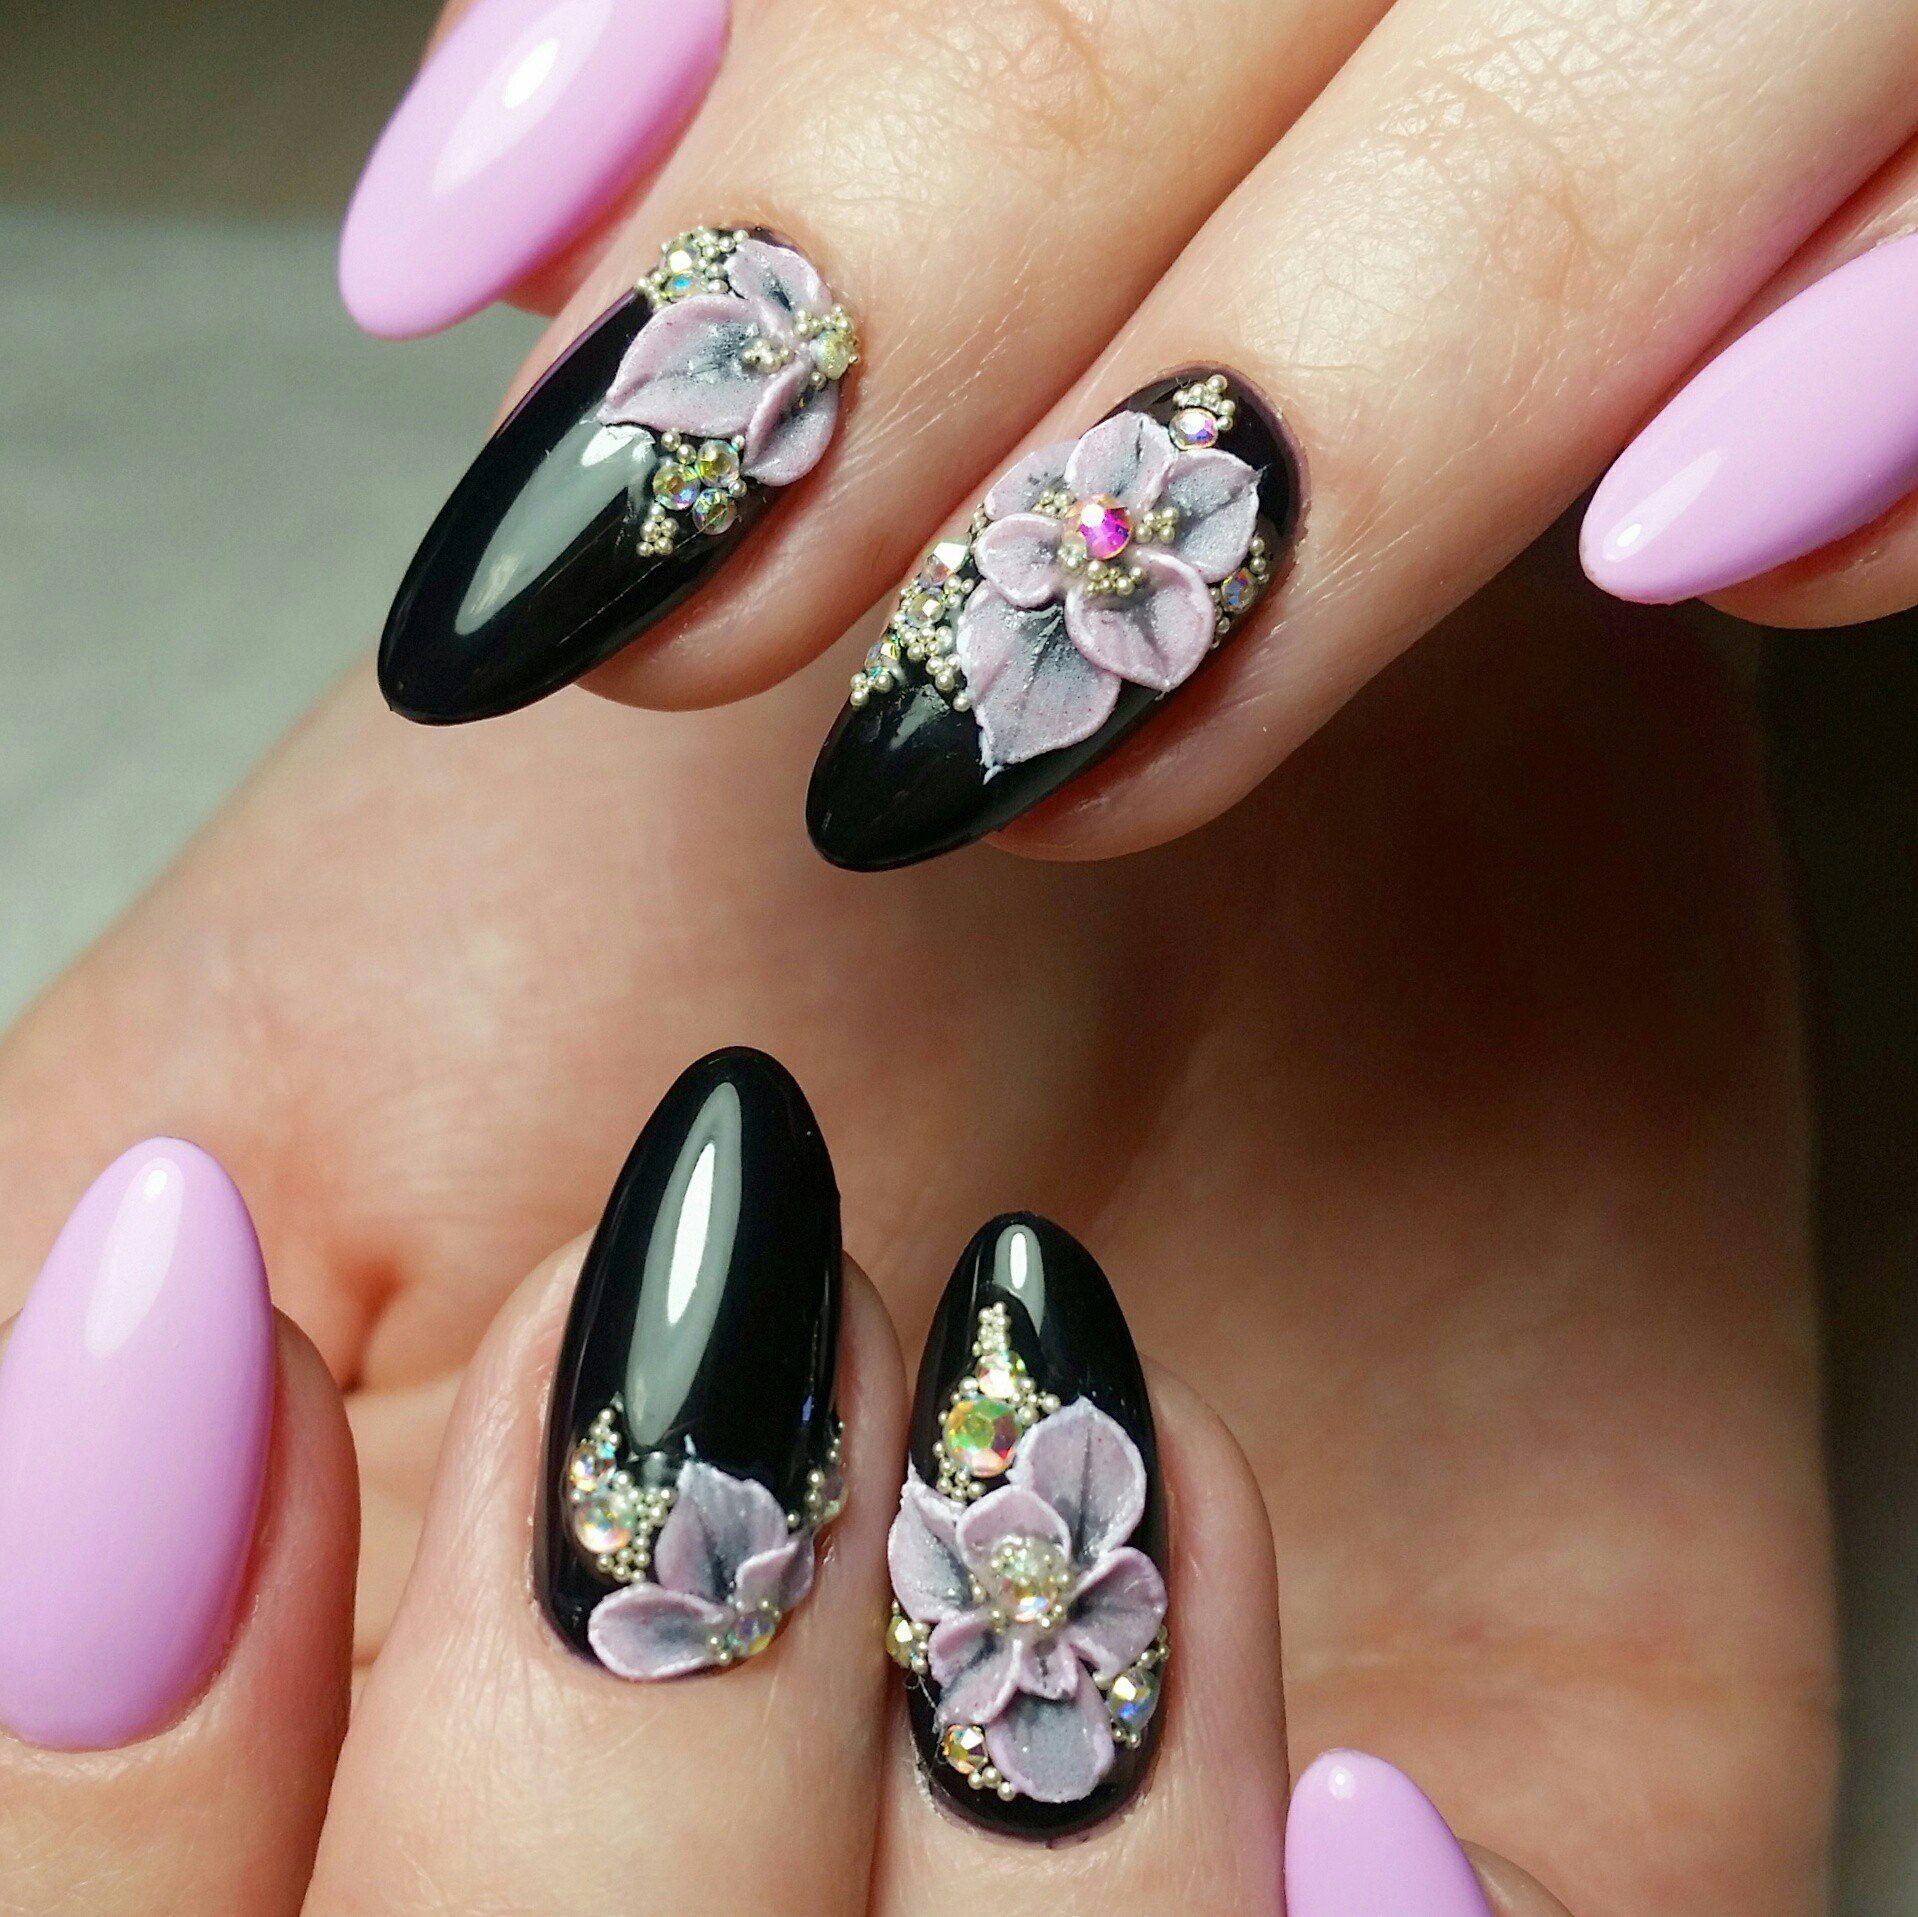 Pin by Наталья on Маникюр | Pinterest | Fall nails 2016, Nail nail ...